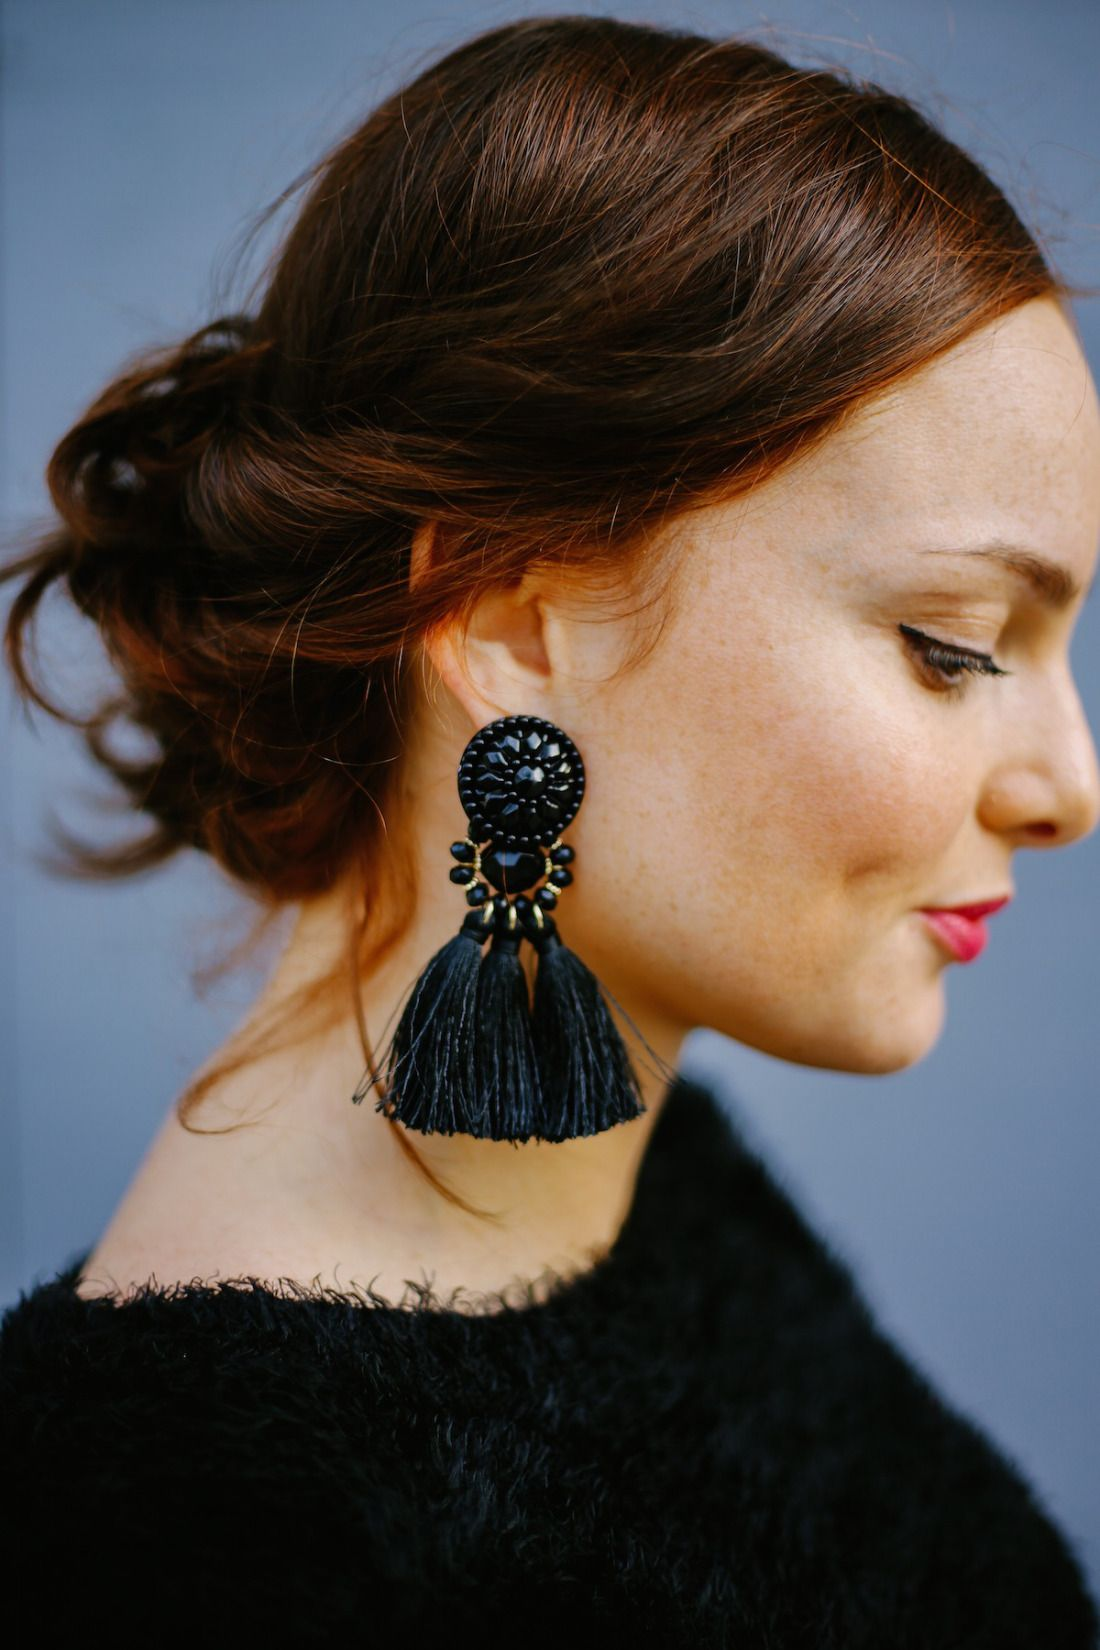 eb7085ec98dc0 pendientes de fiesta invierno blog moda earrings fashion blogger ...